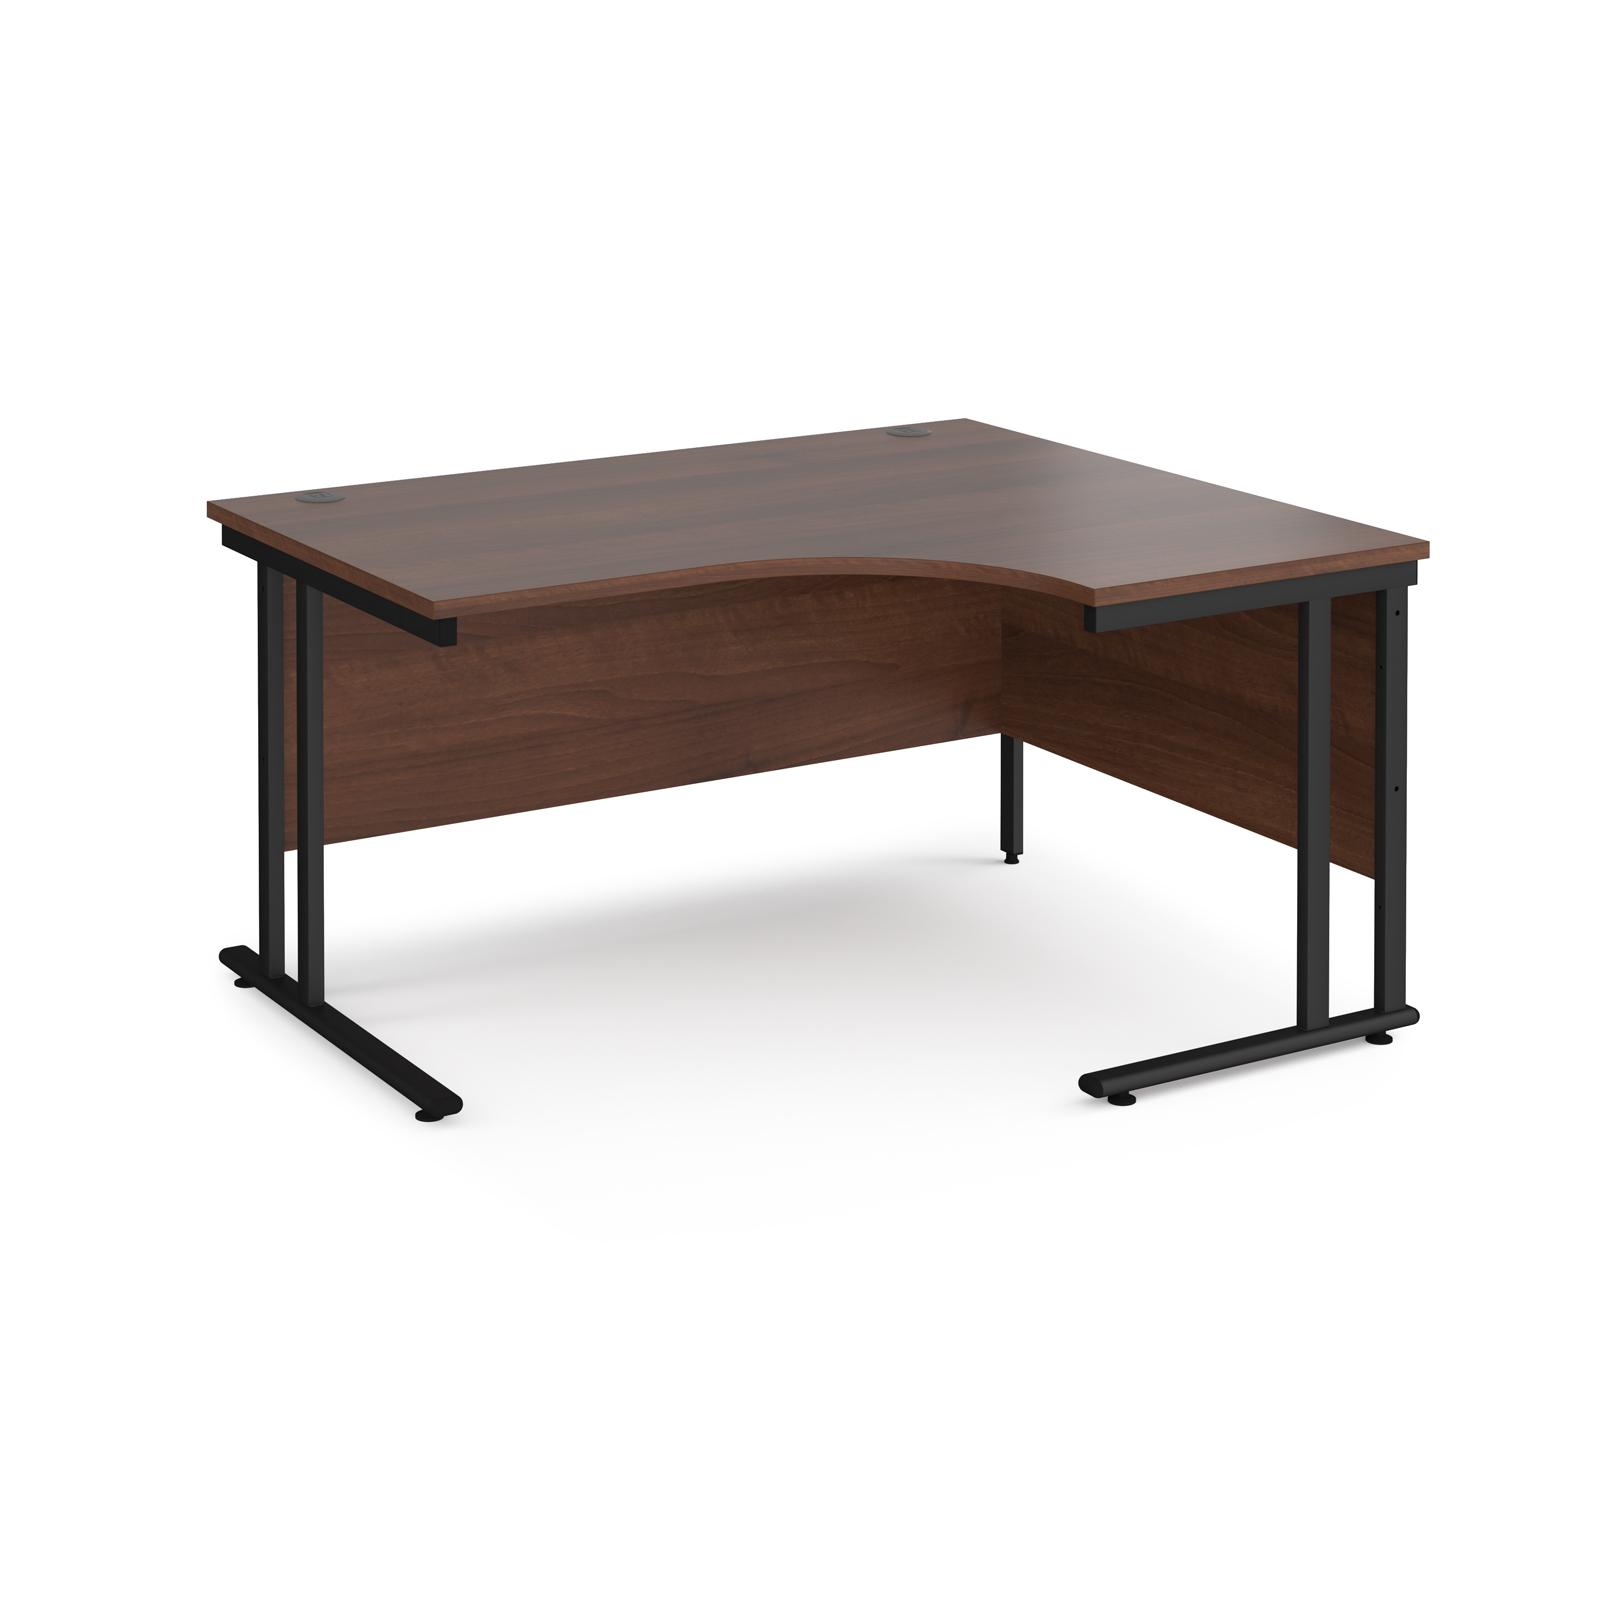 Right Handed Maestro 25 right hand ergonomic desk 1400mm wide - black cantilever leg frame, walnut top